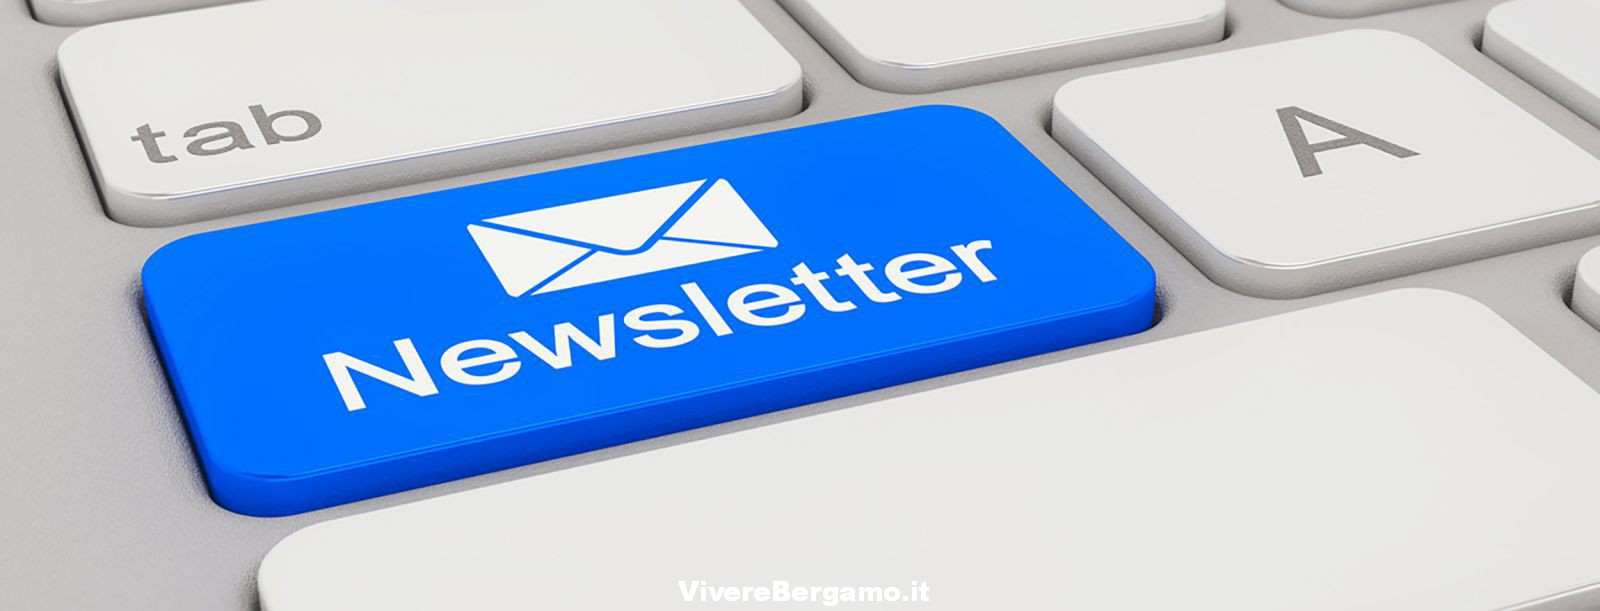 newsletter Vivere Bergamo Notizie